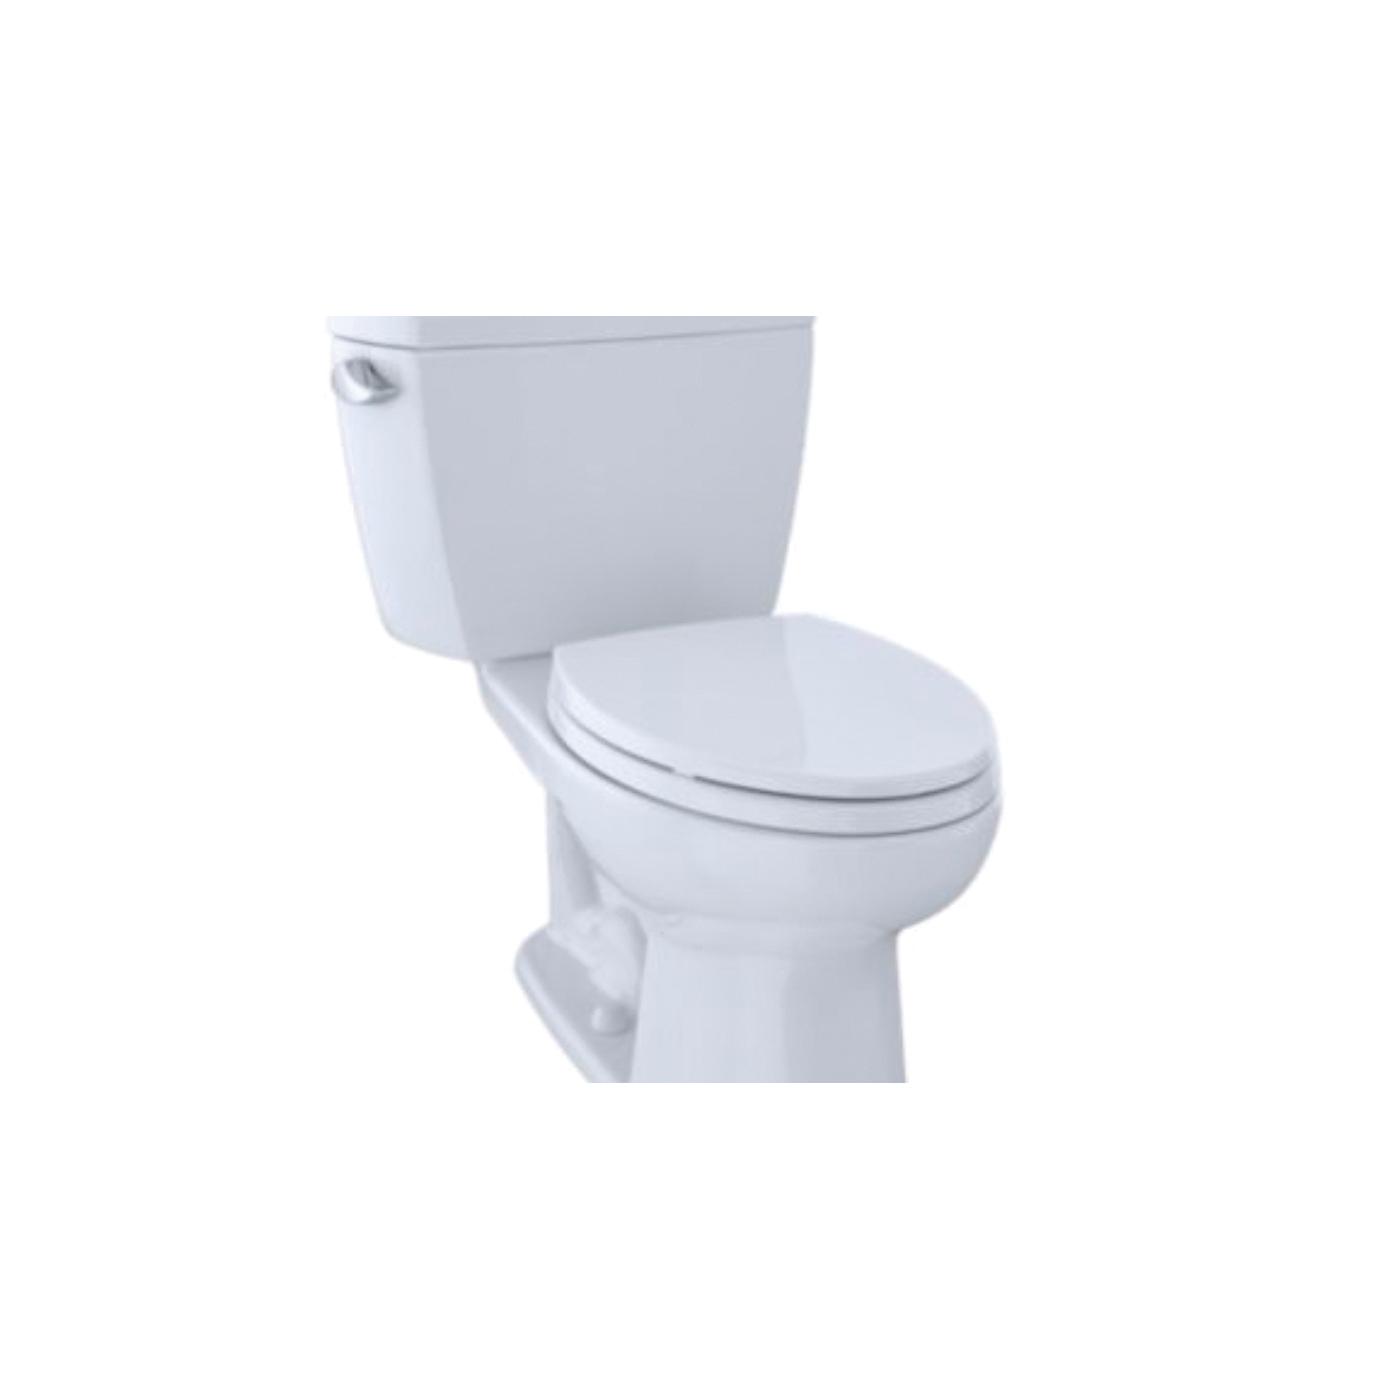 Toto® Eco Drake® CST744E#01 2-Piece Close Coupled Toilet, Elongated Front Bowl, 15-5/8 in H Rim, 1.28 gpf, Cotton